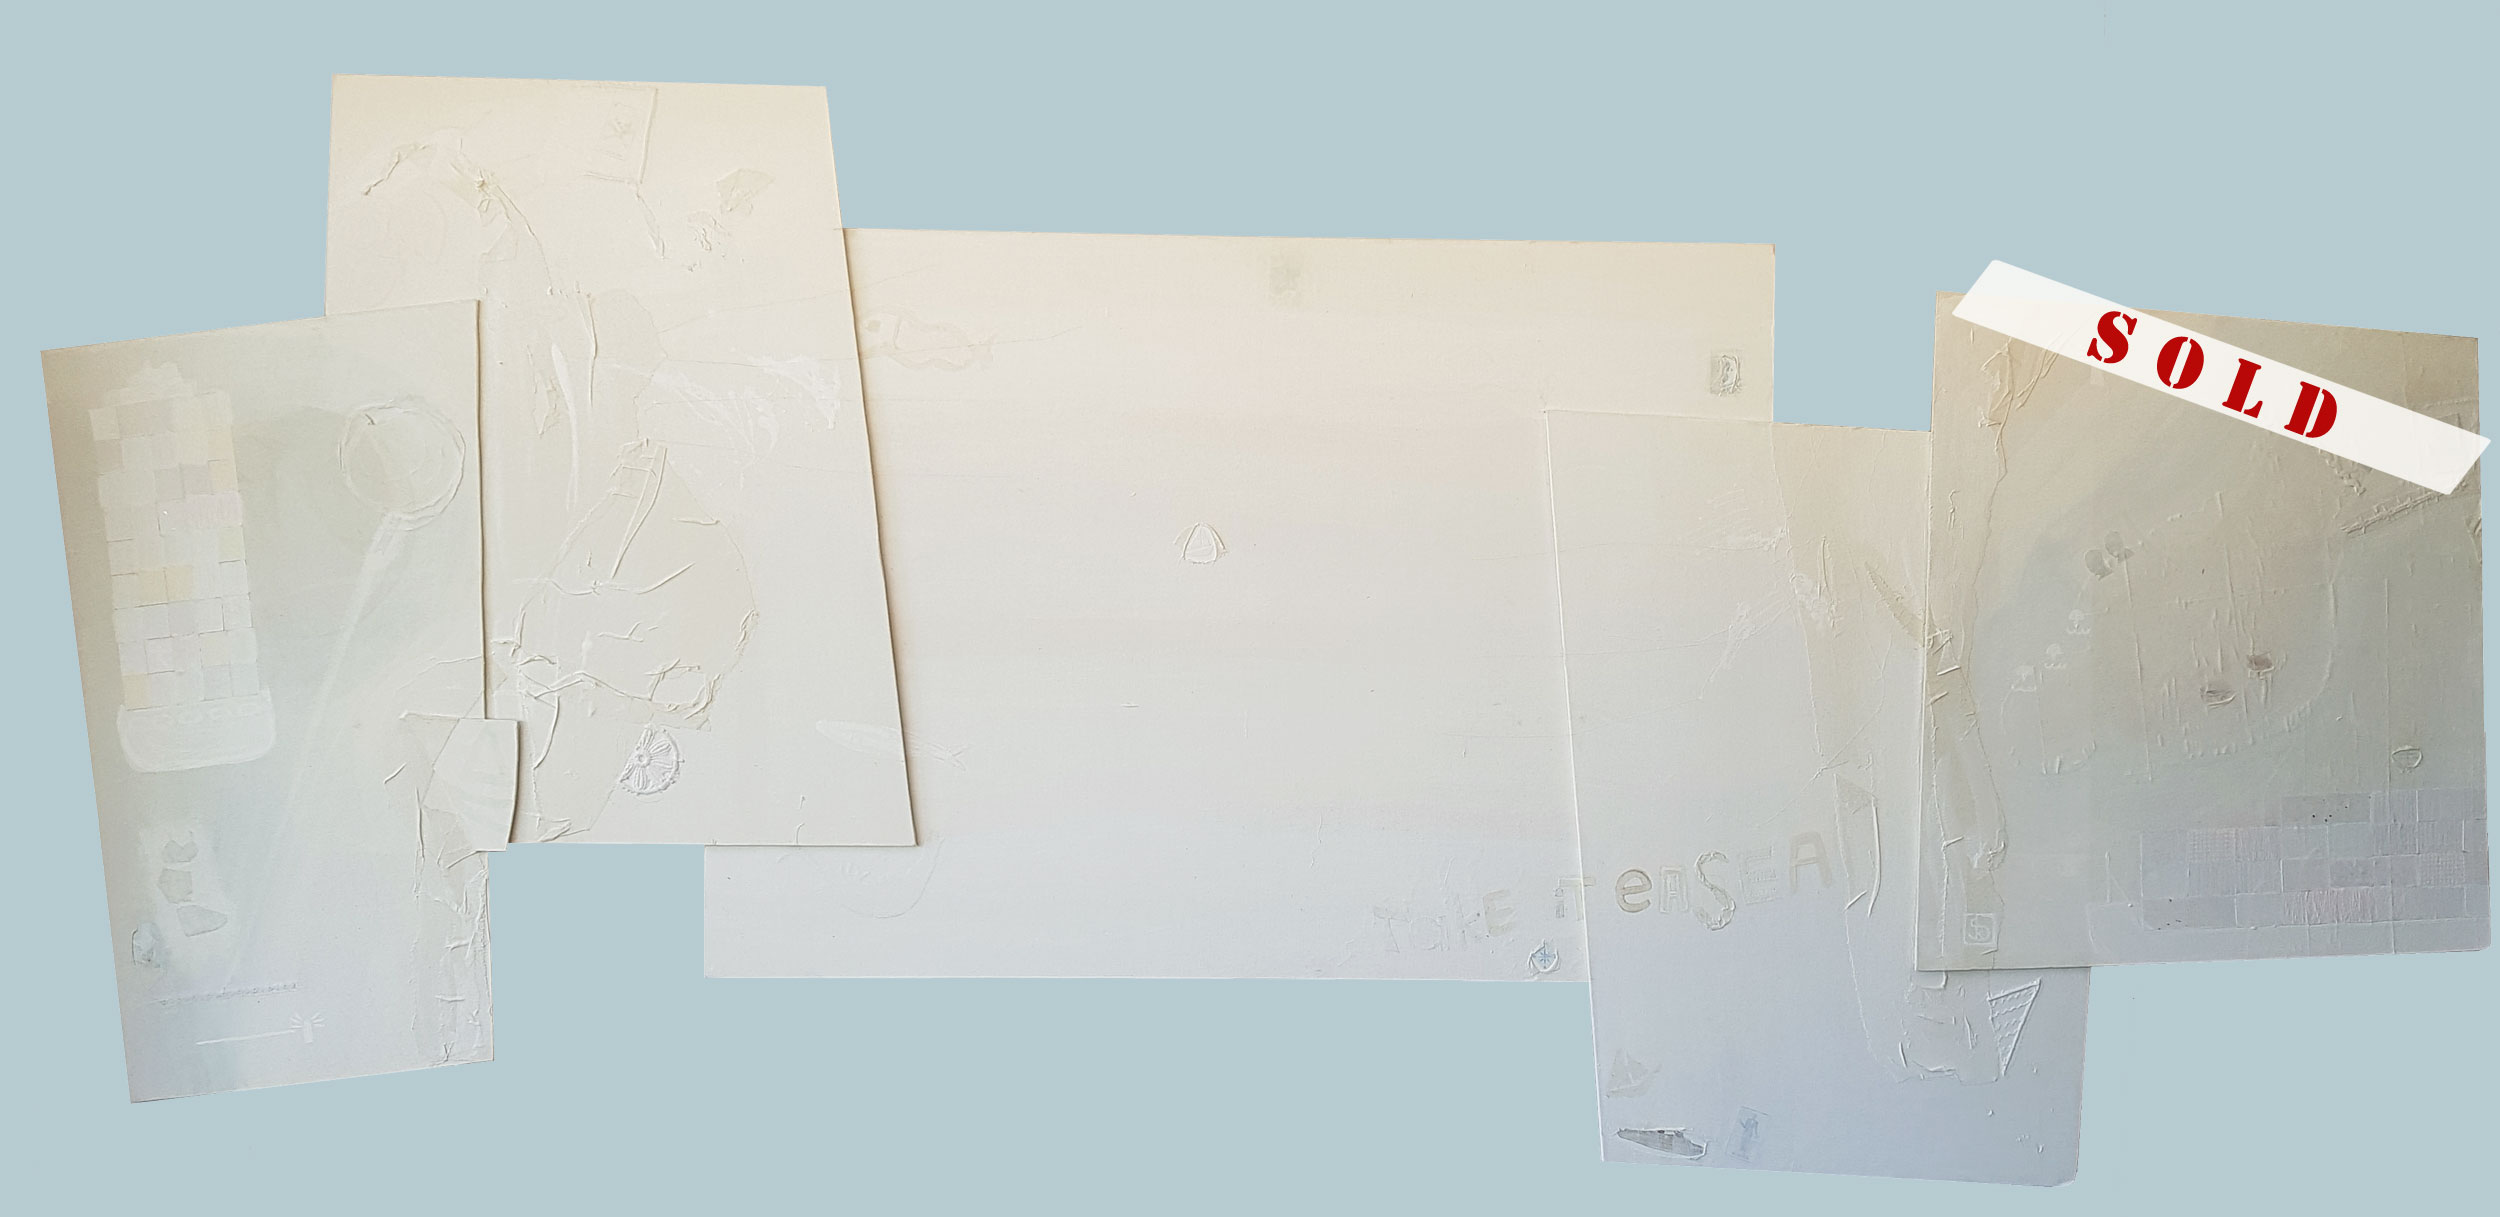 takeiteaSEA - 231 x 96 cm / 90,9 x 37,8 in